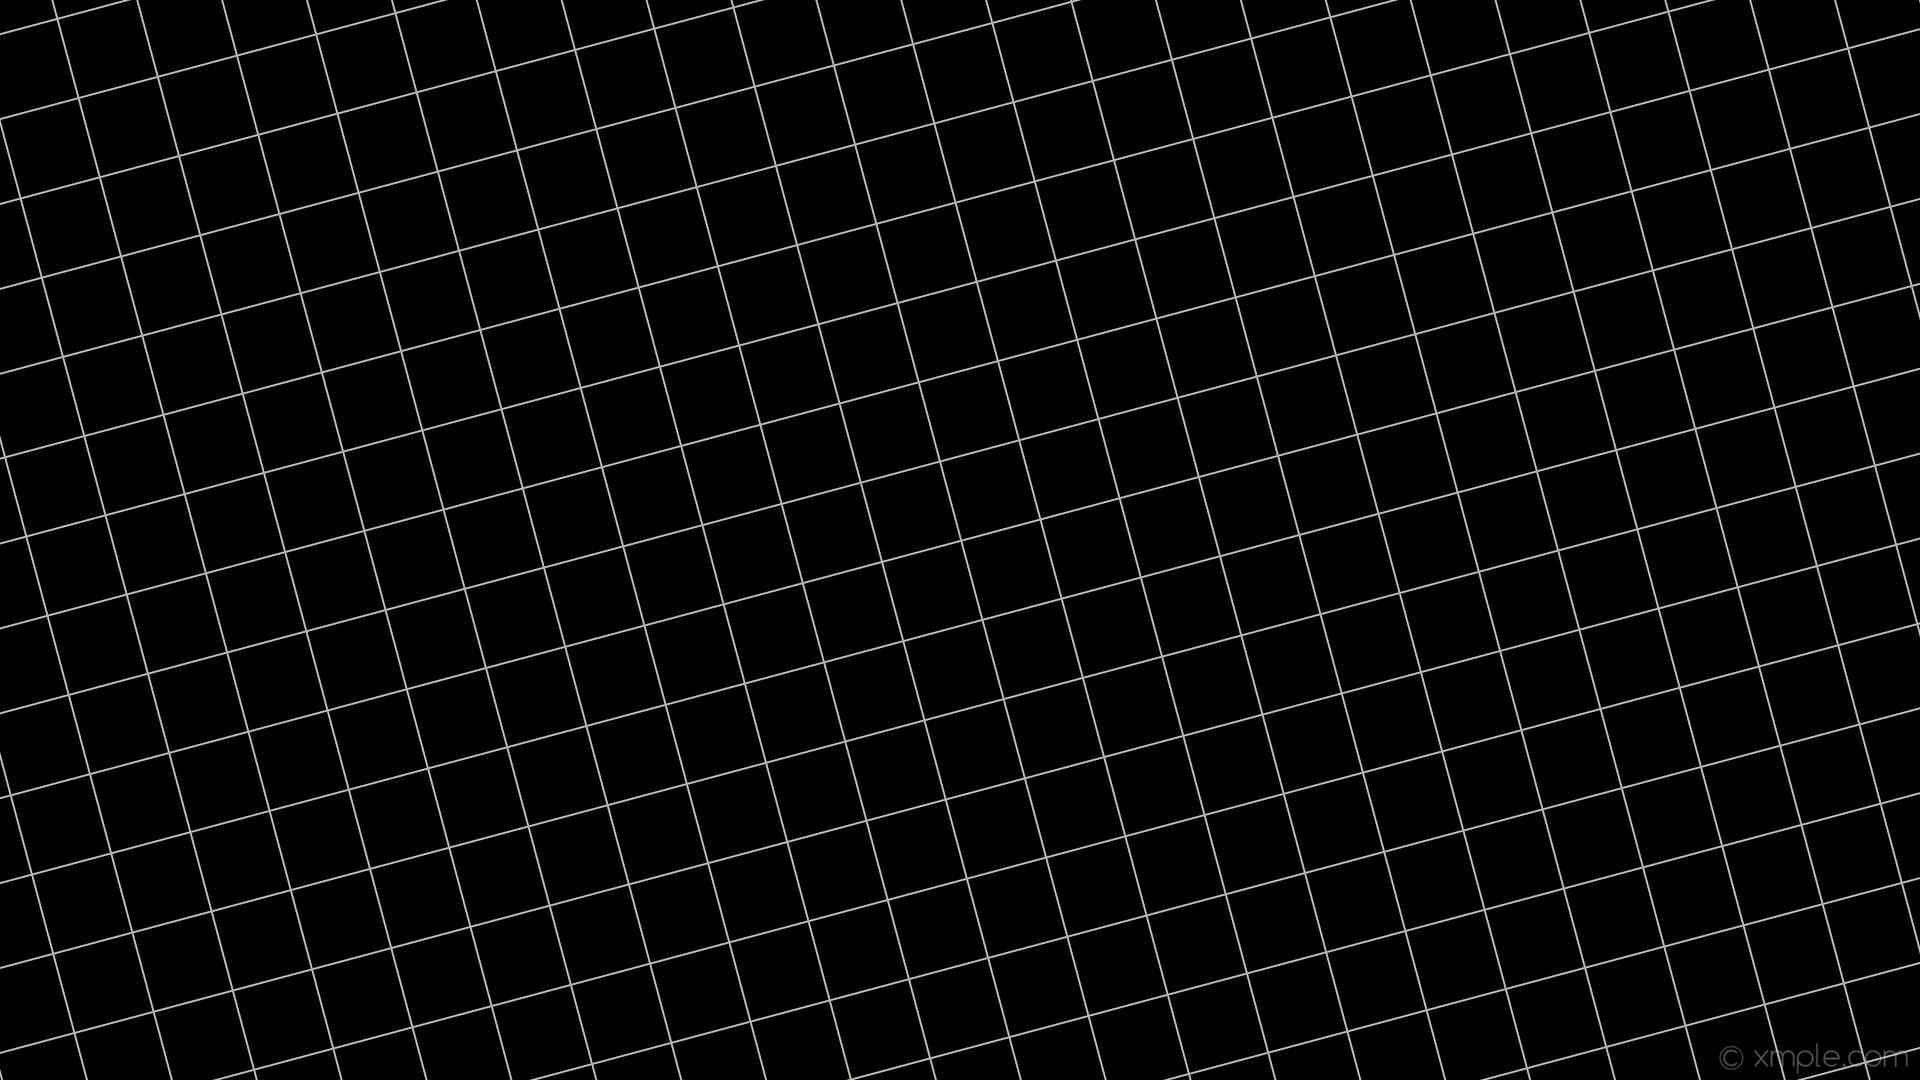 Res: 1920x1080, wallpaper graph paper white black grid floral white #000000 #fffaf0 15° 2px  82px